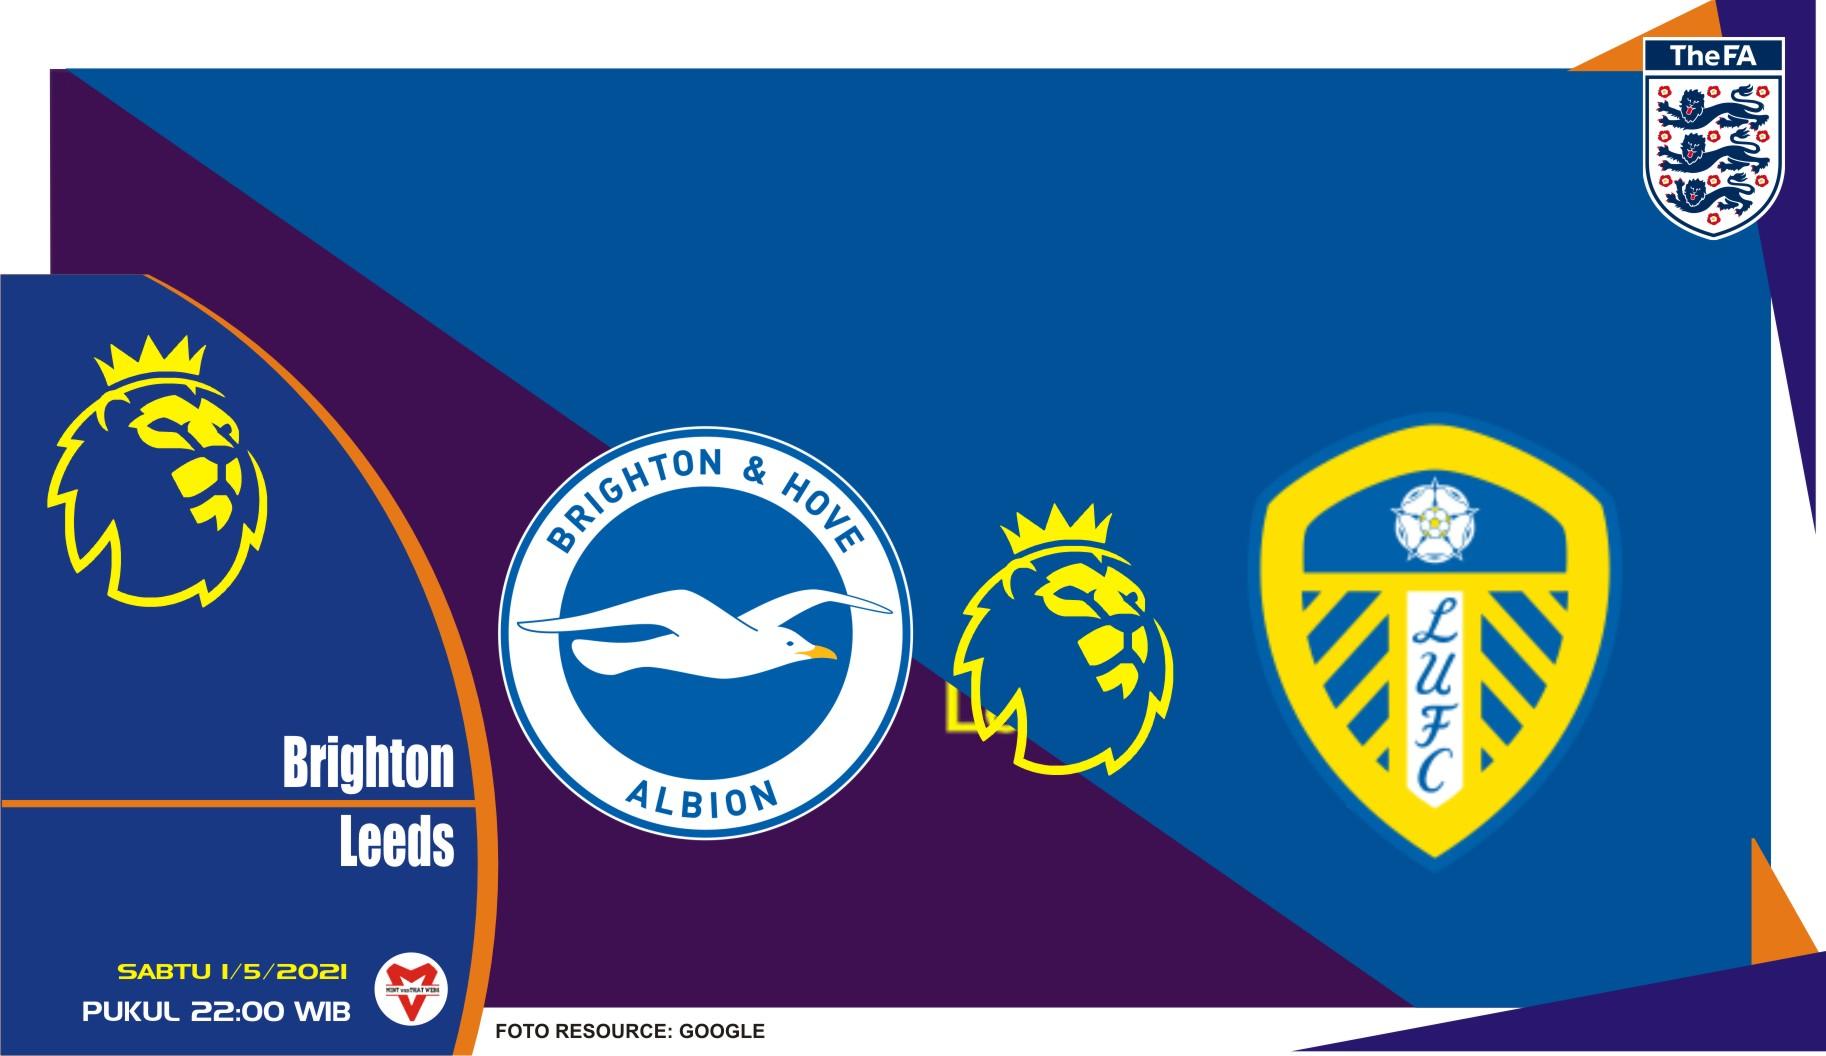 Prediksi Liga Inggris: Brighton & Hove Albion vs Leeds United - 1 Mei 2021